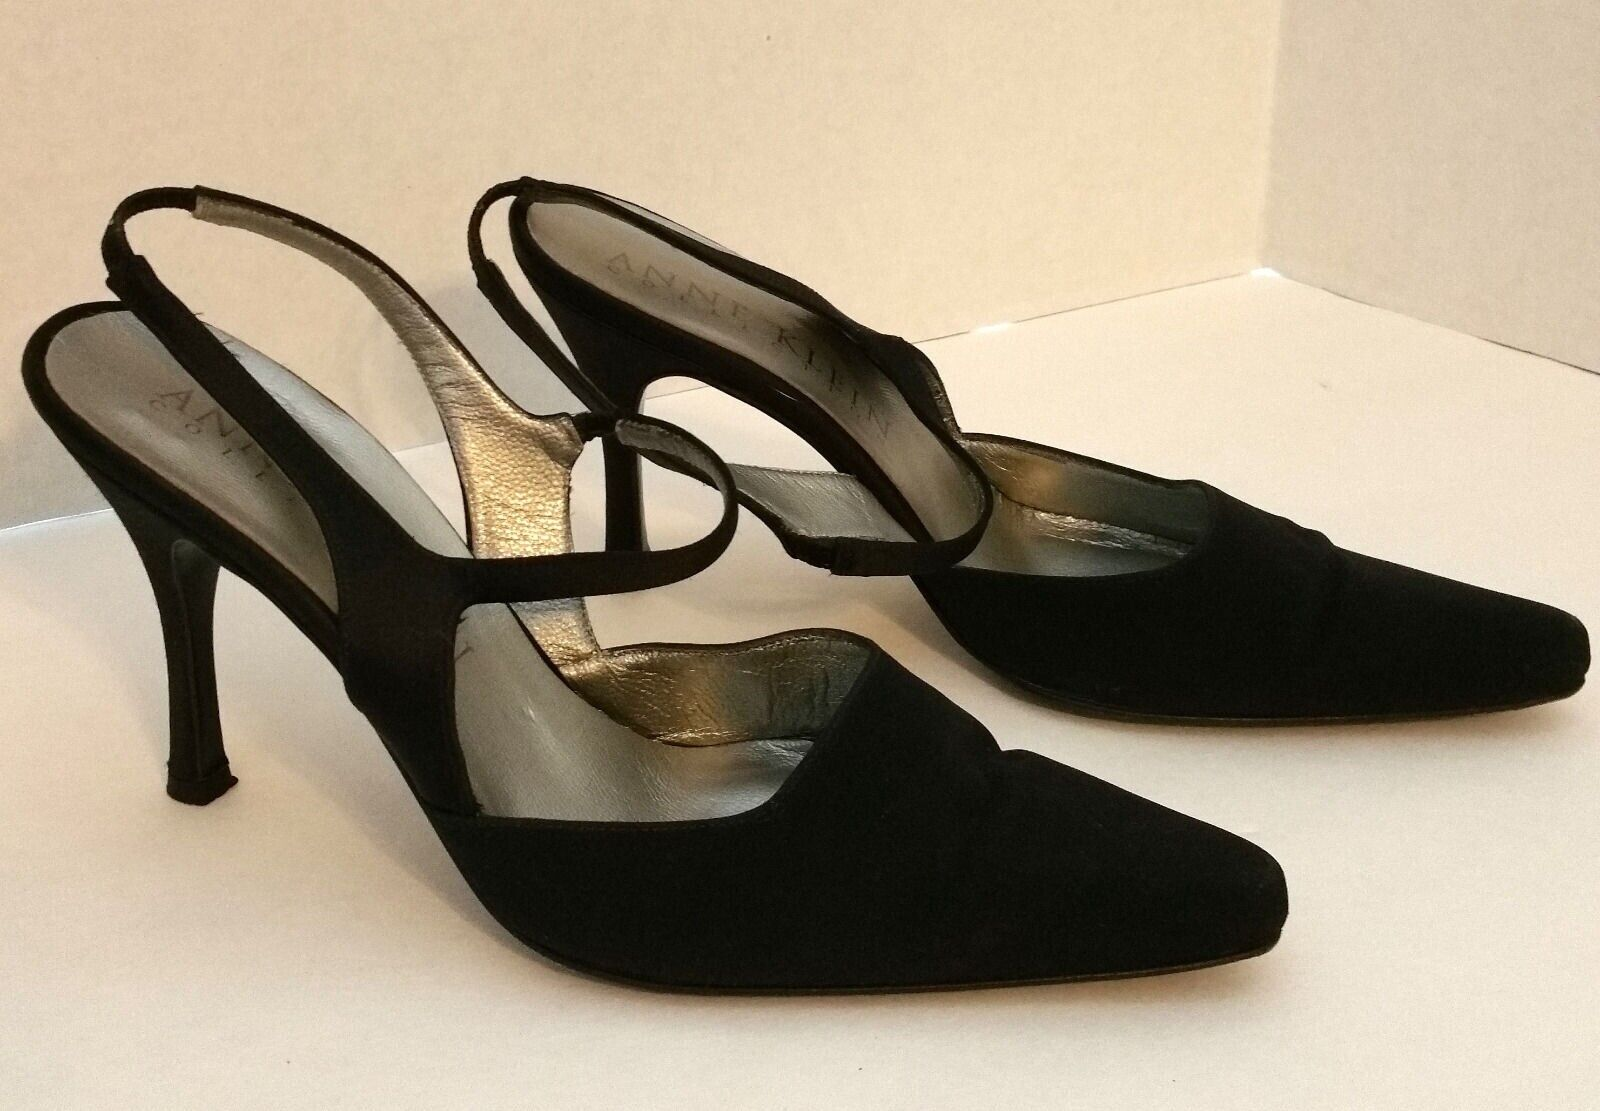 ANNE KLEIN Black Fabric Dressy Heels Slingbacks Shoes Size 7